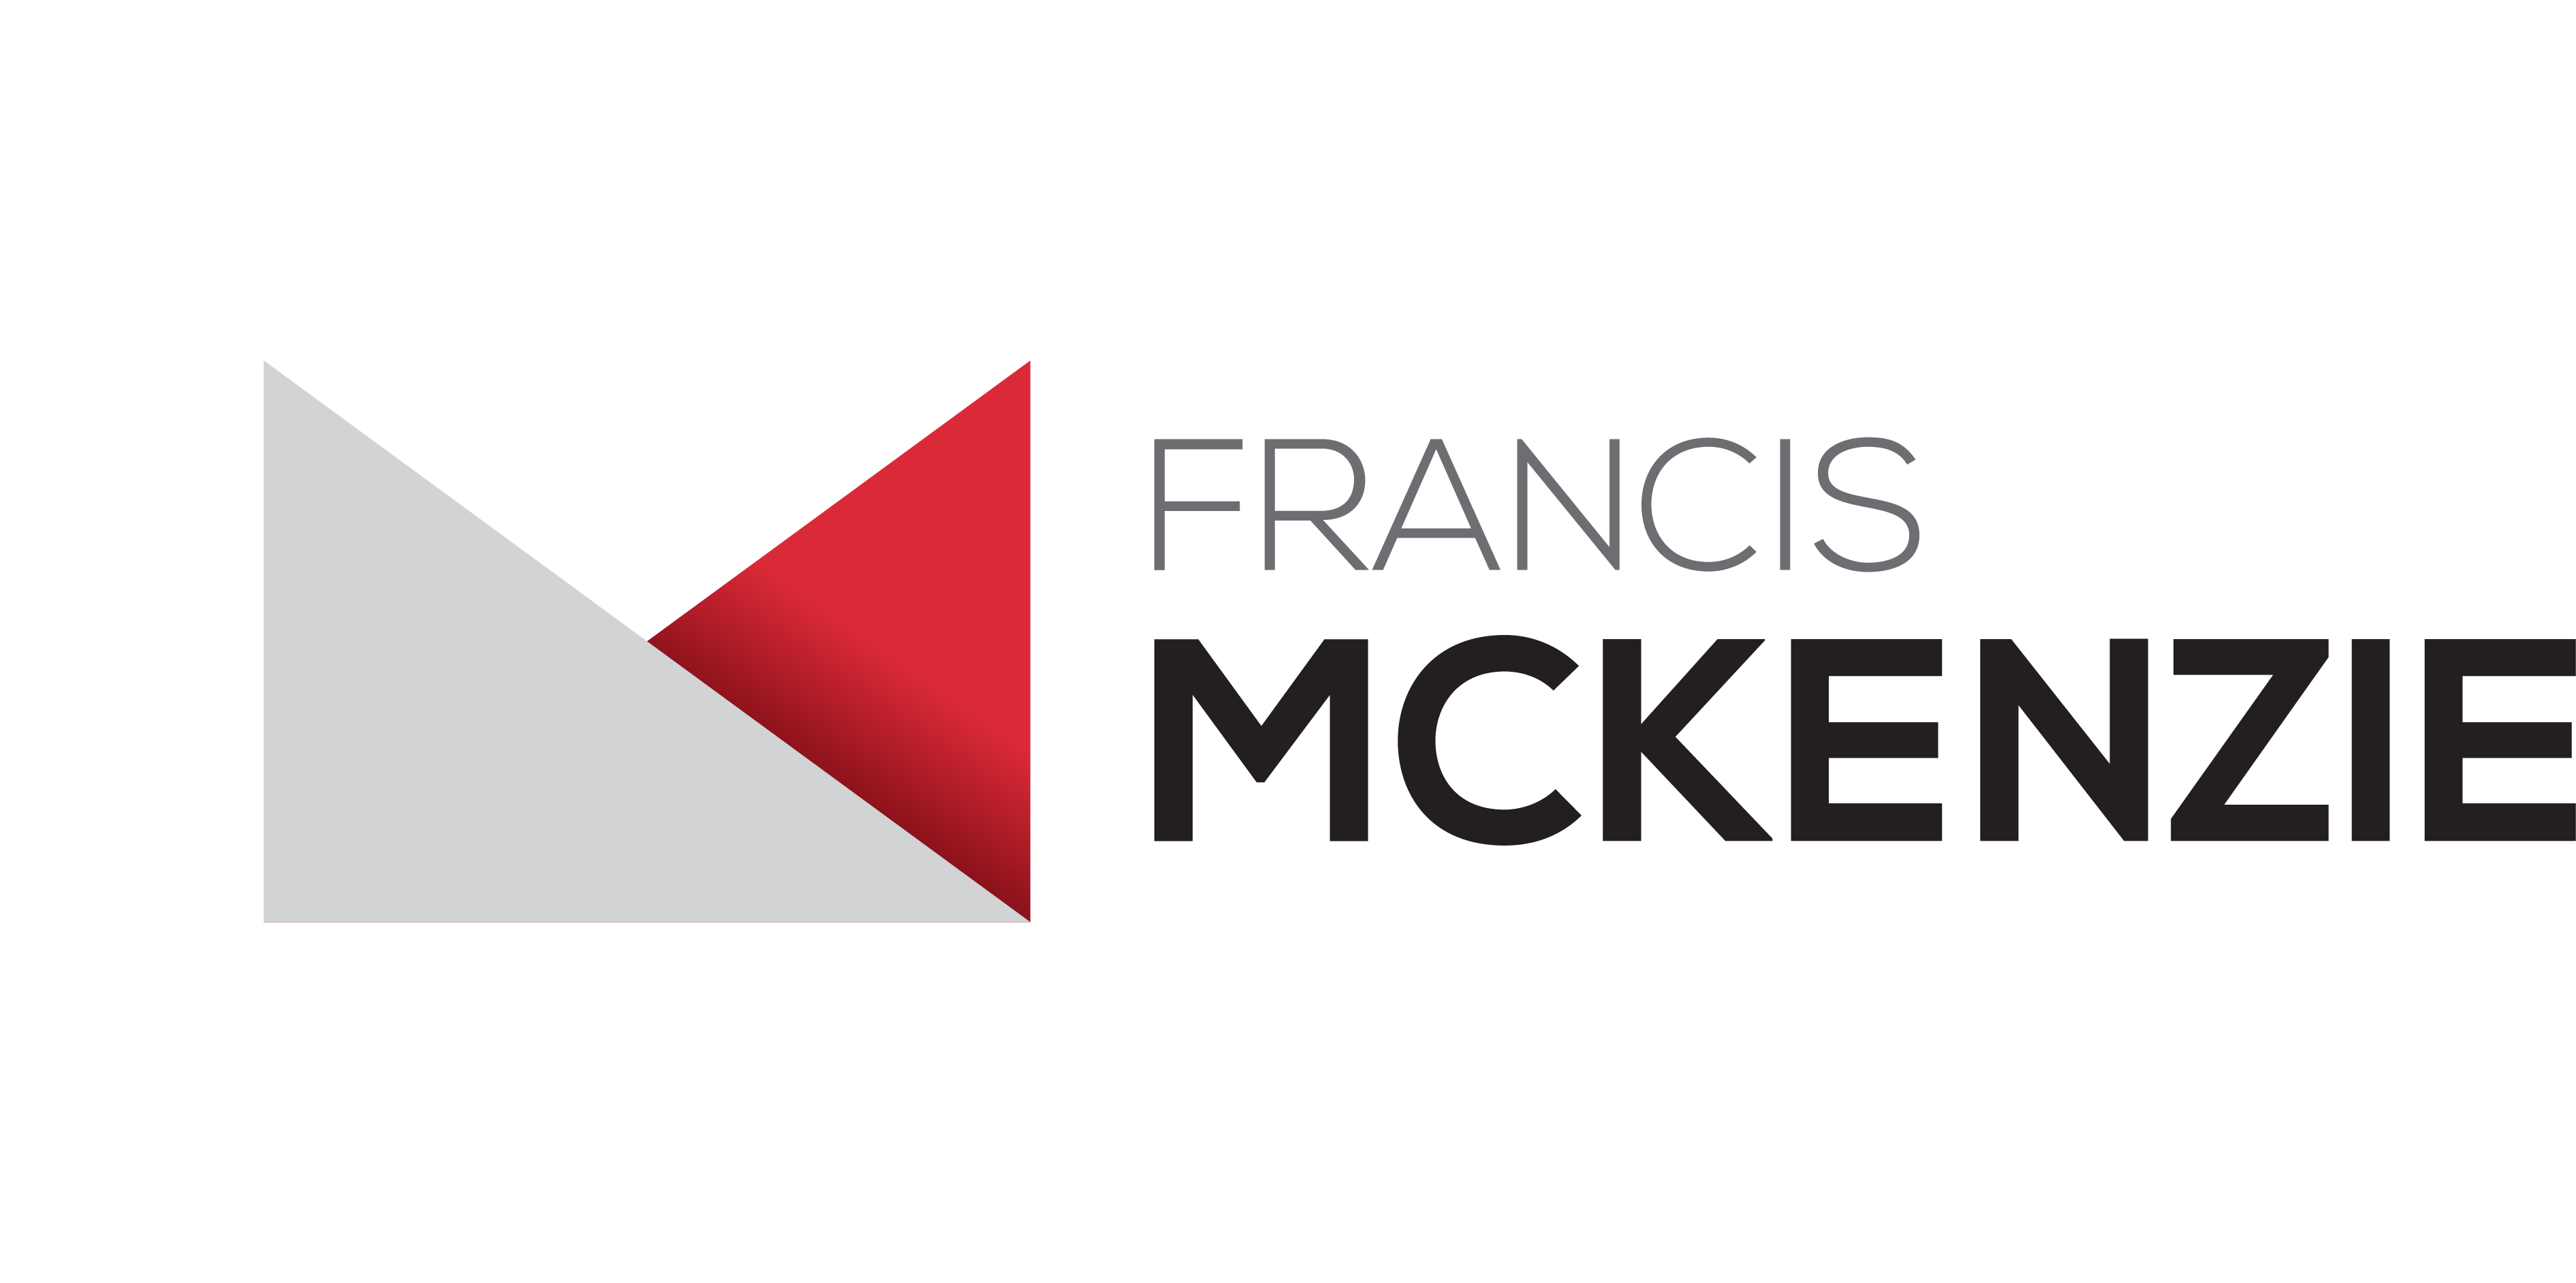 FRANCIS MCKENZIE LOGO FINAL-Horizontal